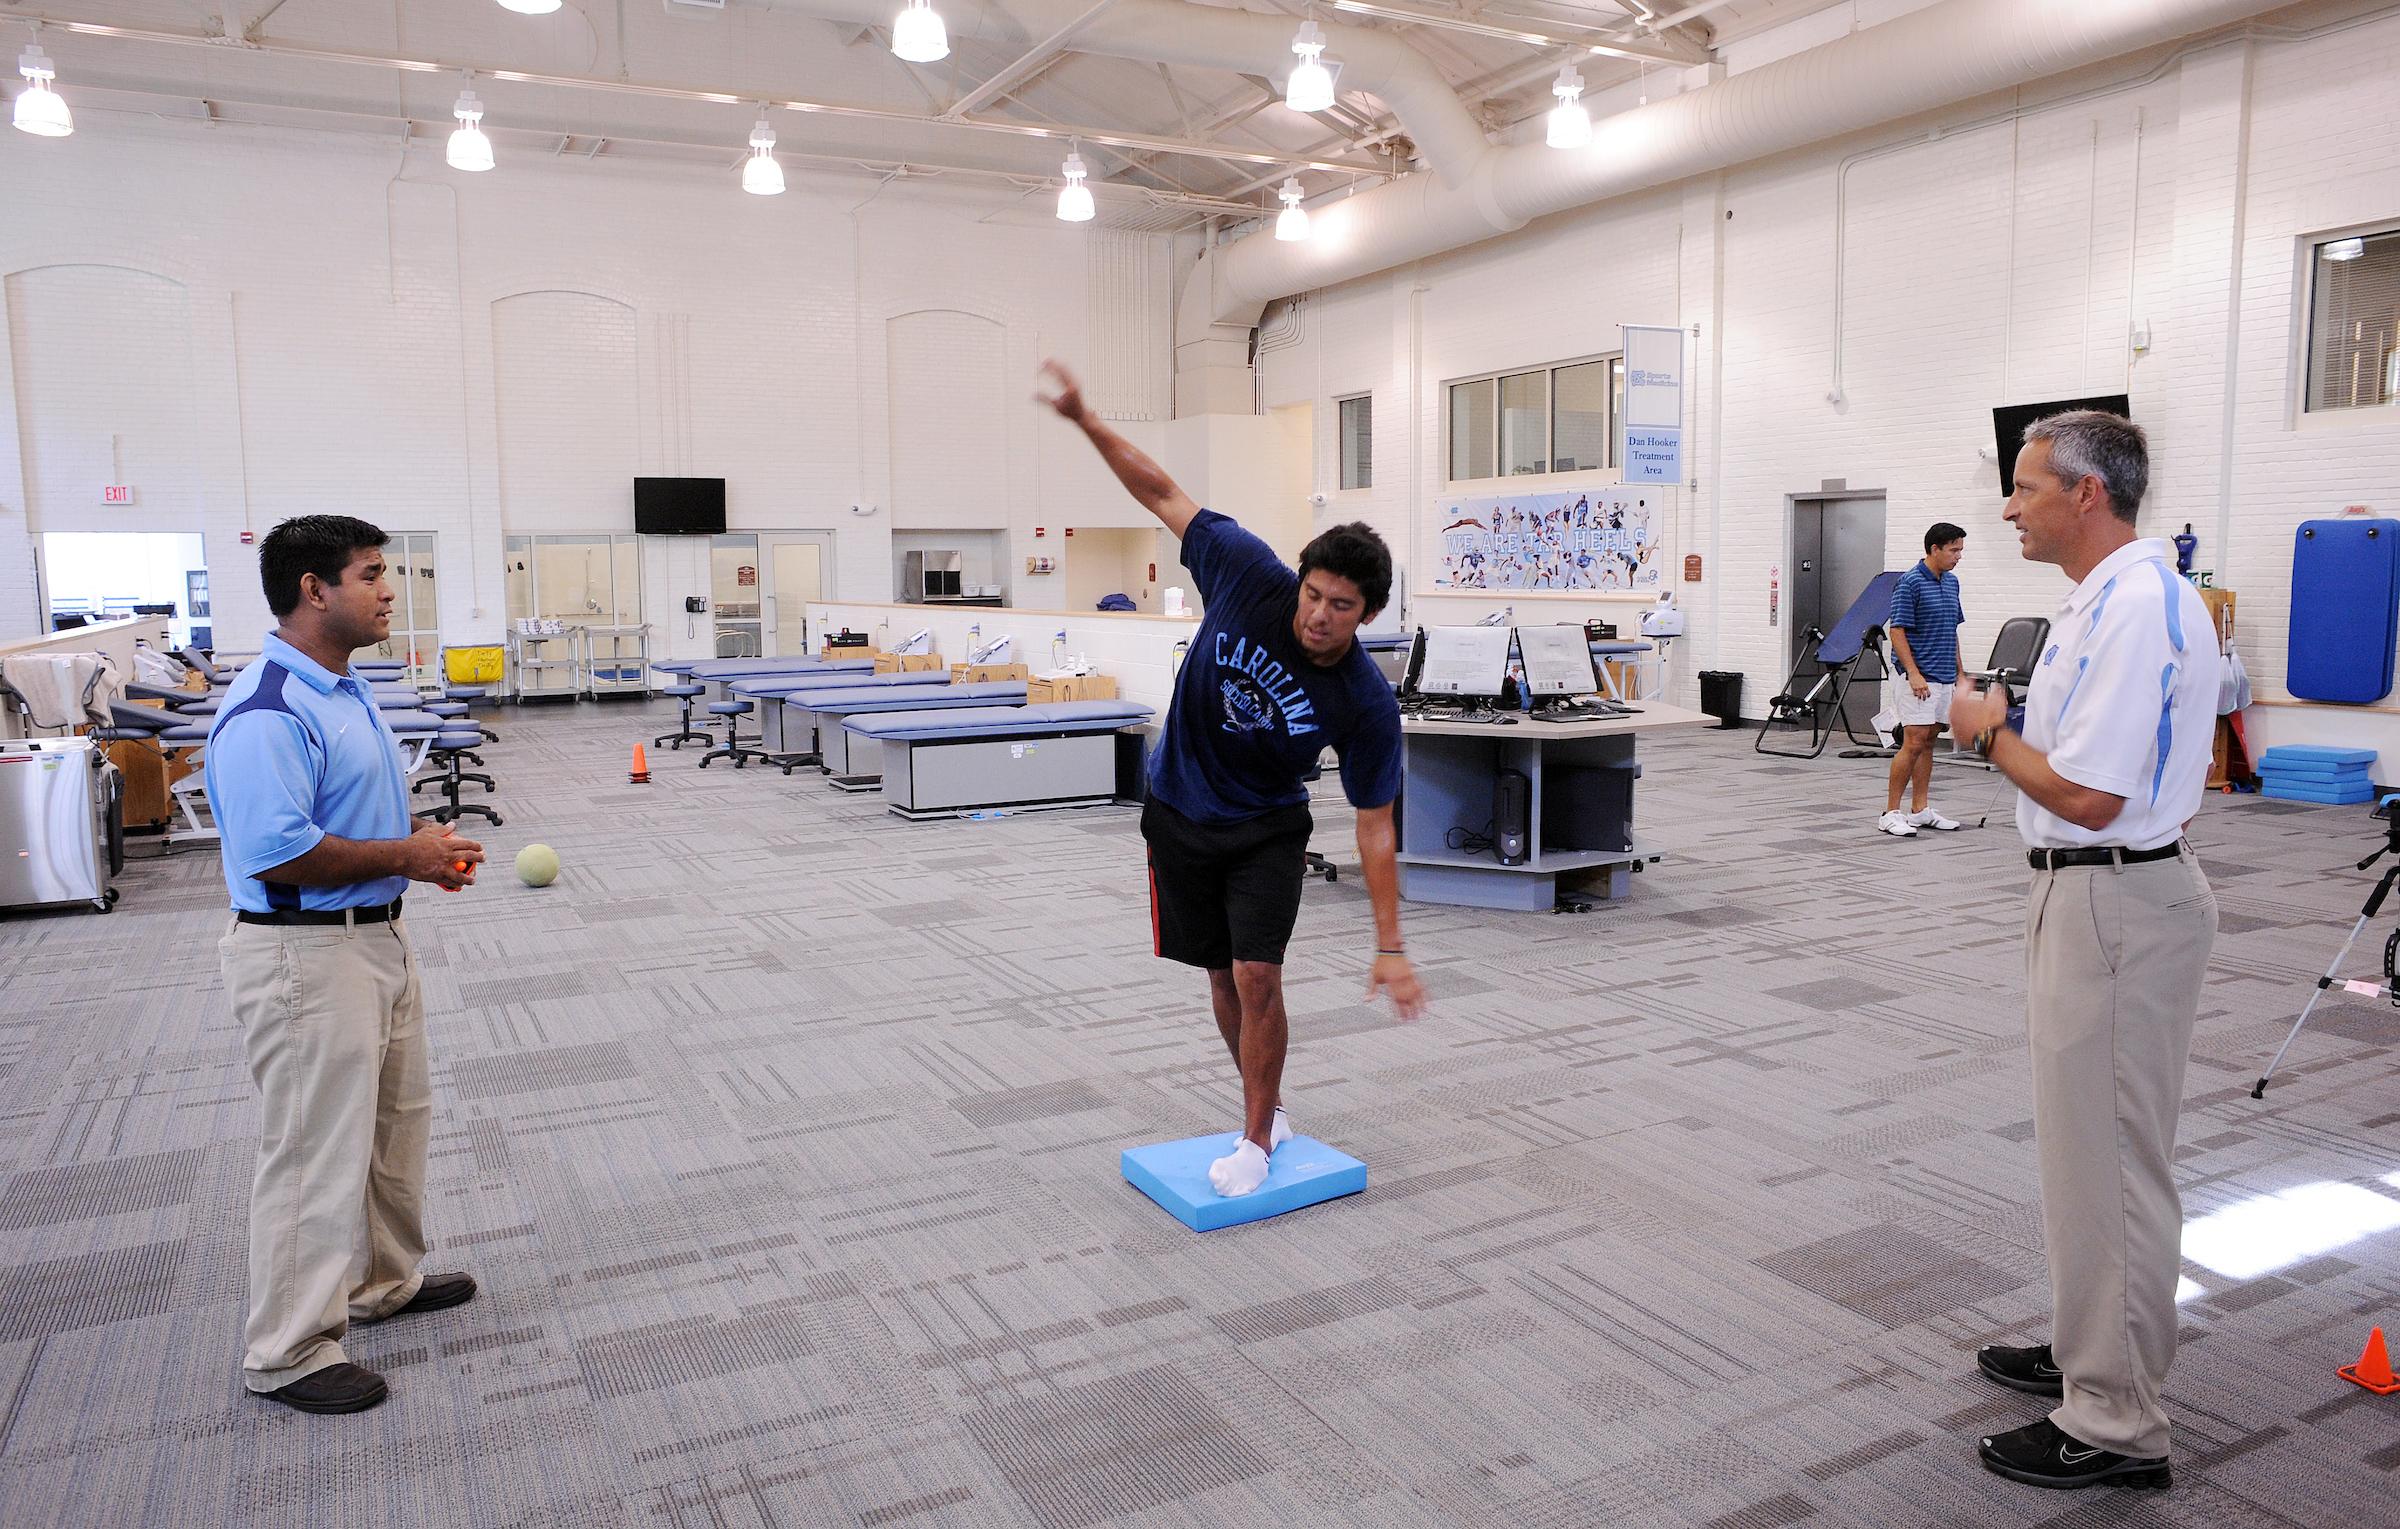 Researchers watch as a test subject balances on a small blue mat.